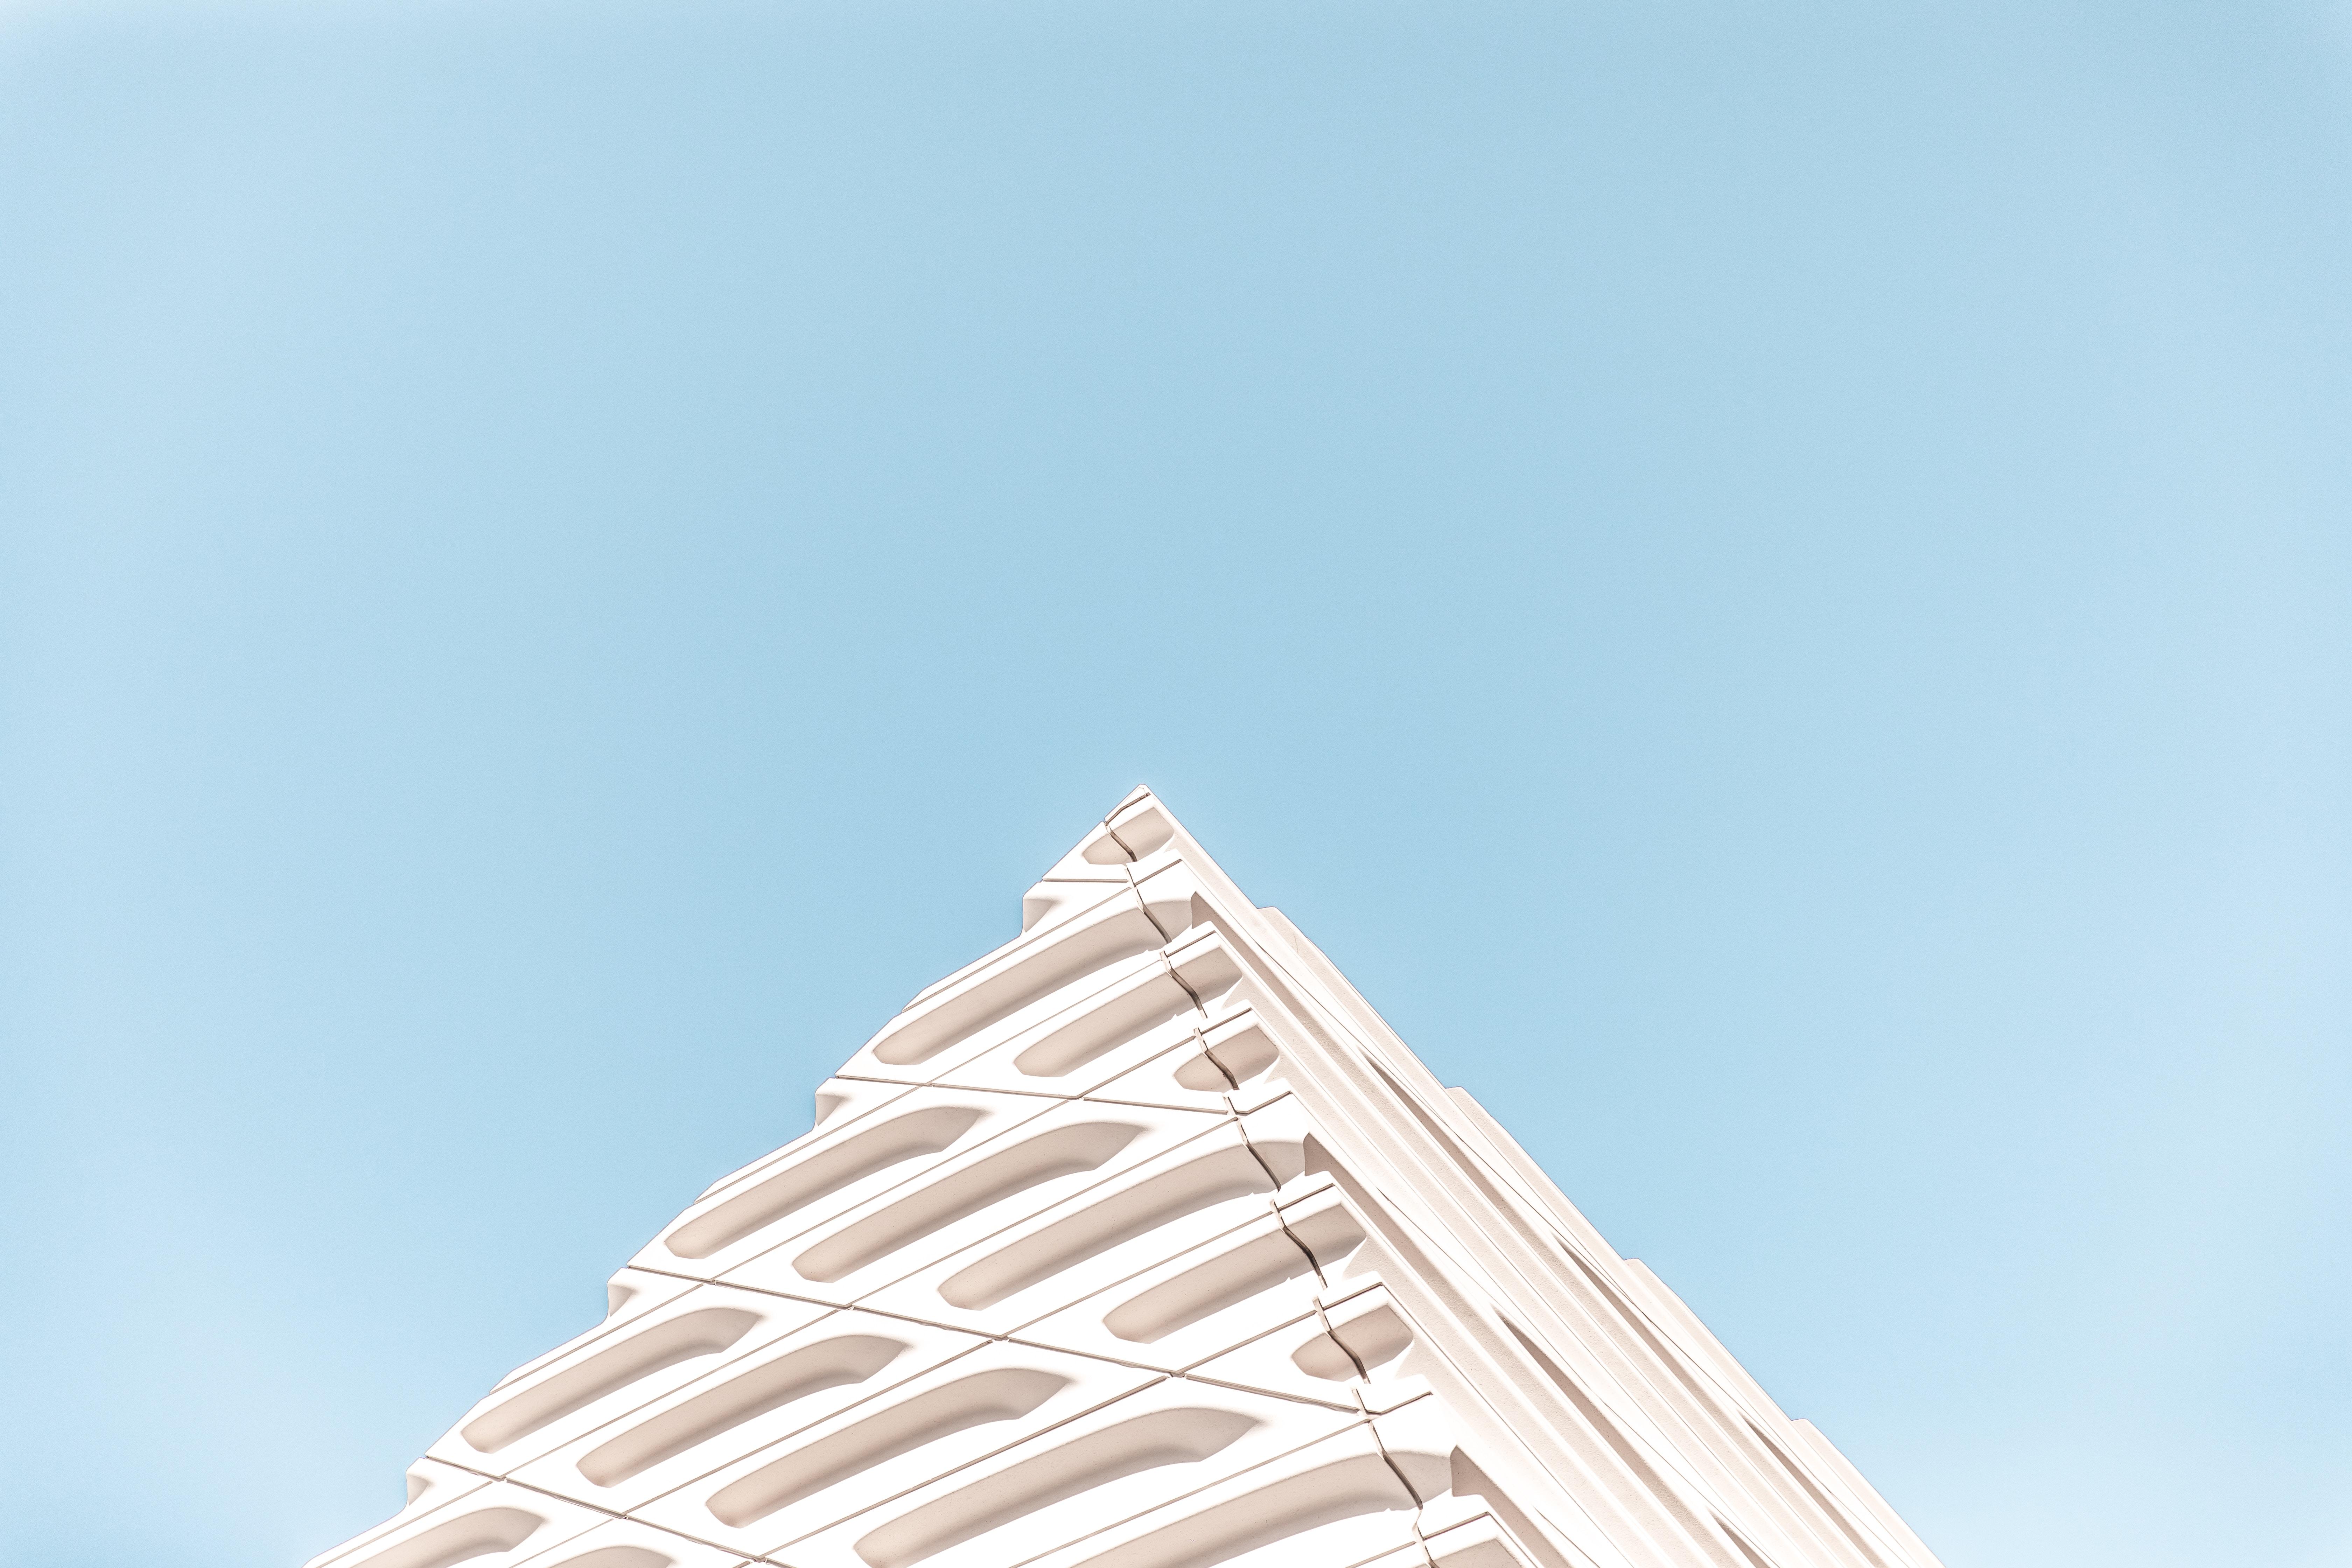 white pyramid structure